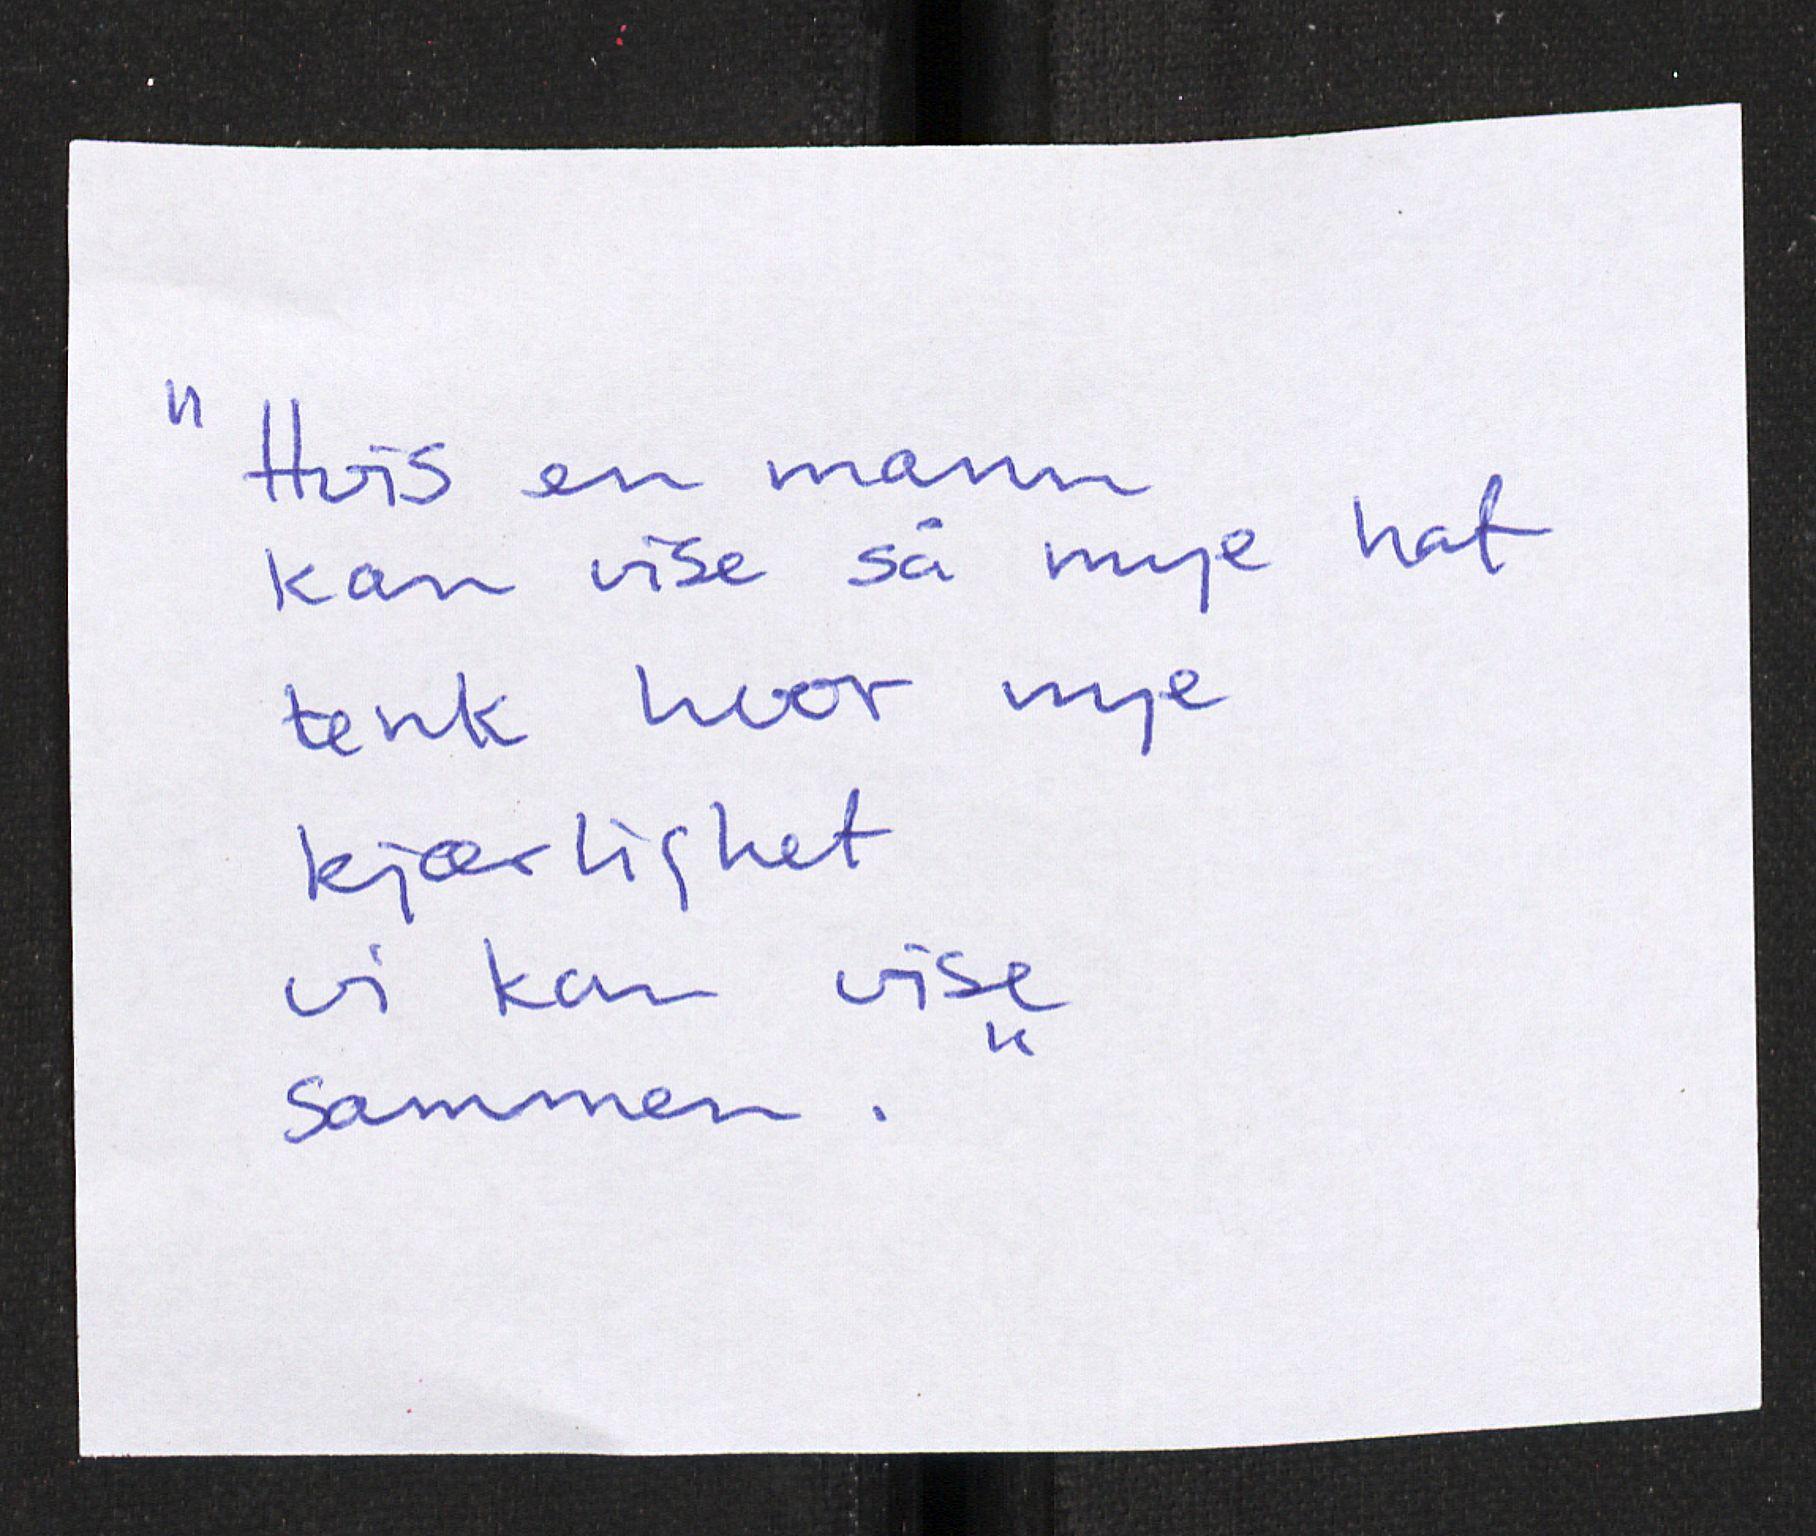 RA, Minnemateriale etter 22.07.2011, 2011, s. 829